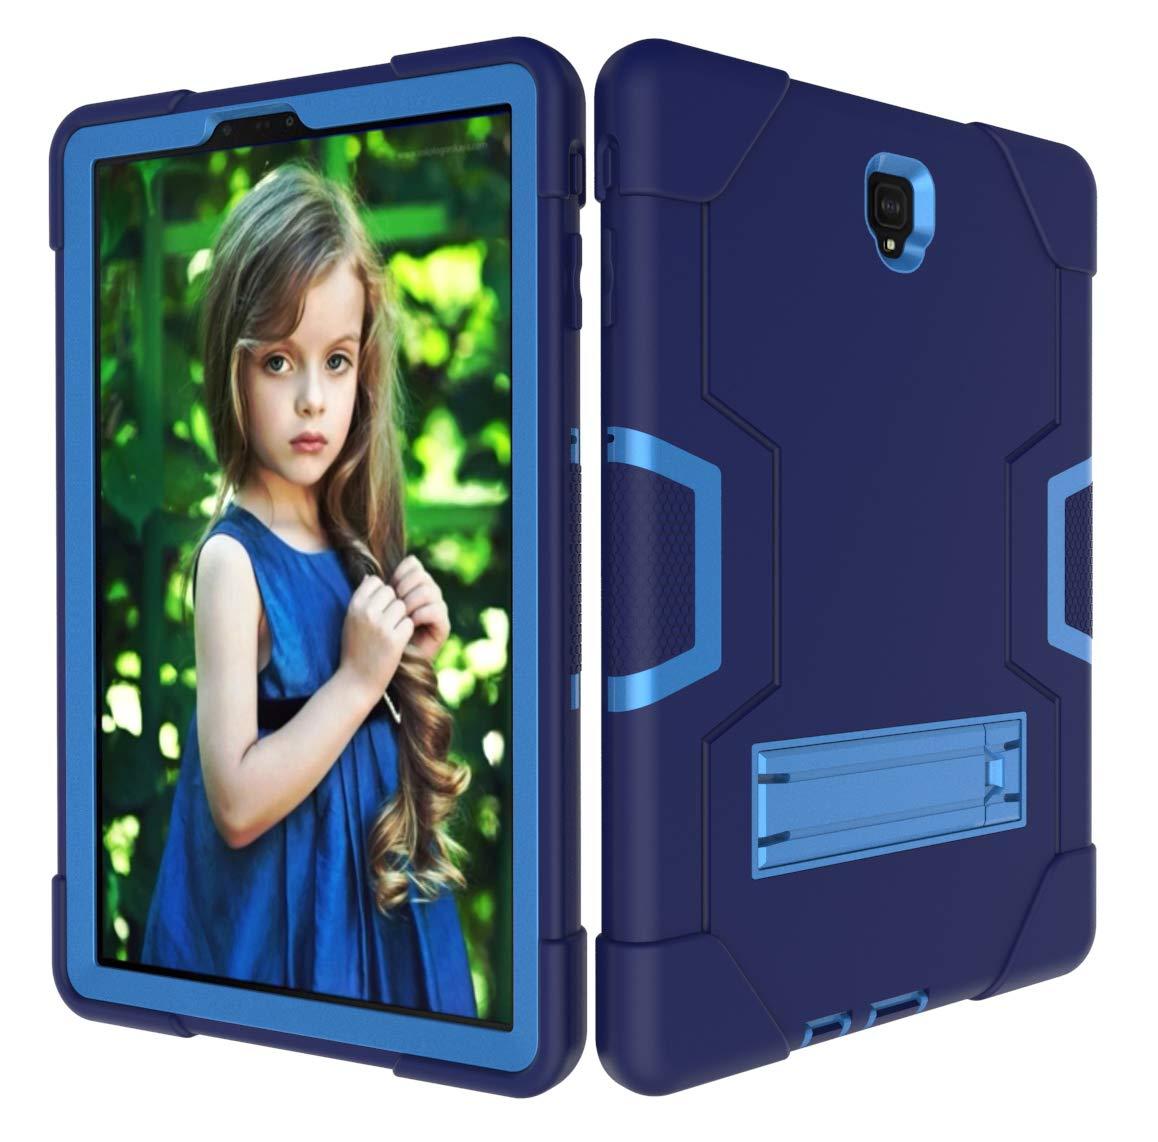 Funda Samsung Galaxy Tab S4 10.5 Hongxinyu [7l75whpp]